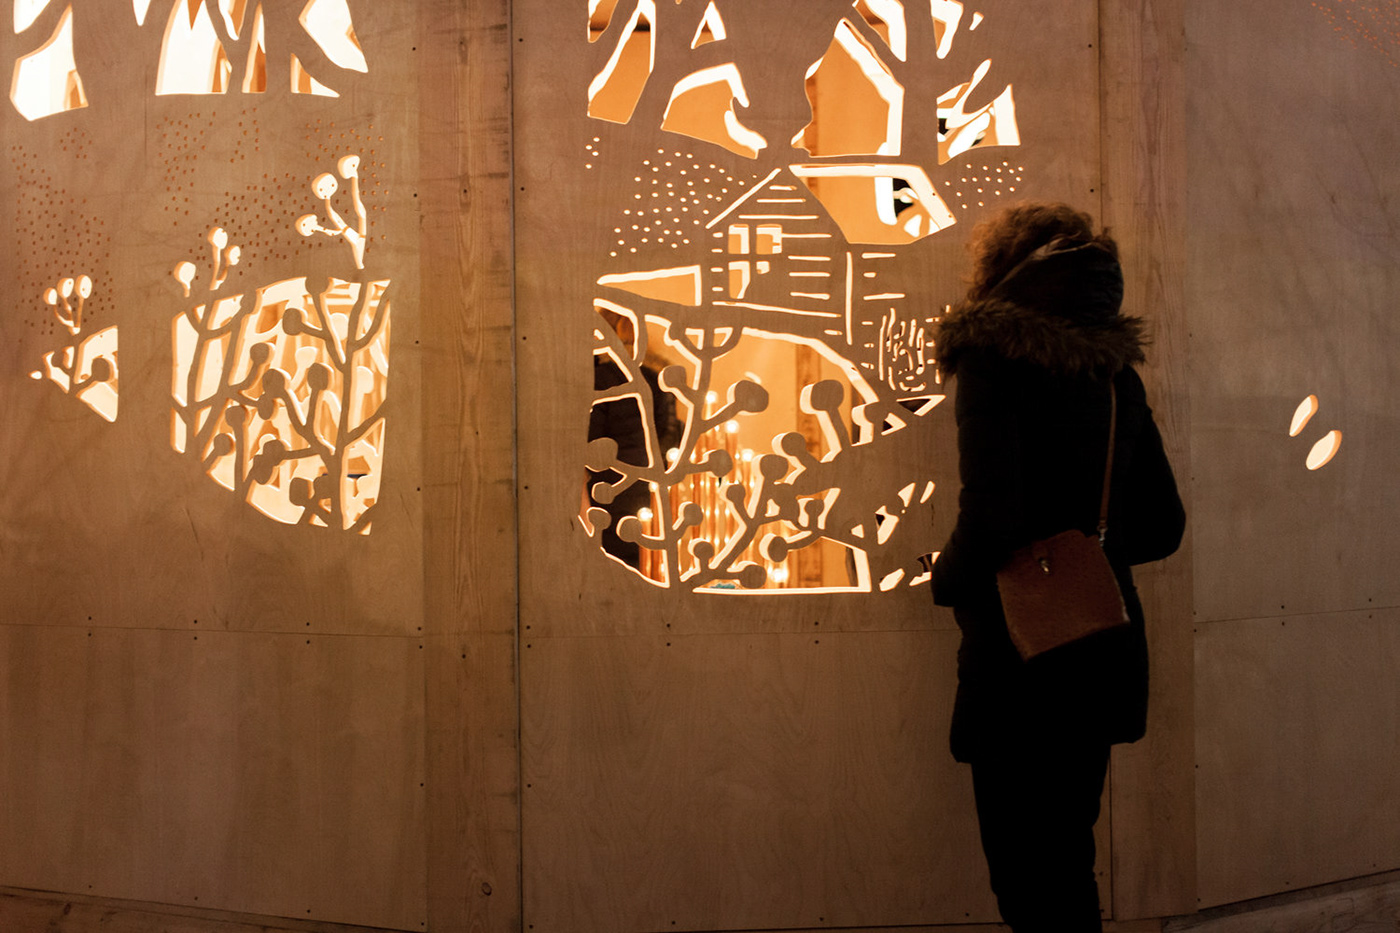 noel market joliette Stories winter installation cutout Christmas wood